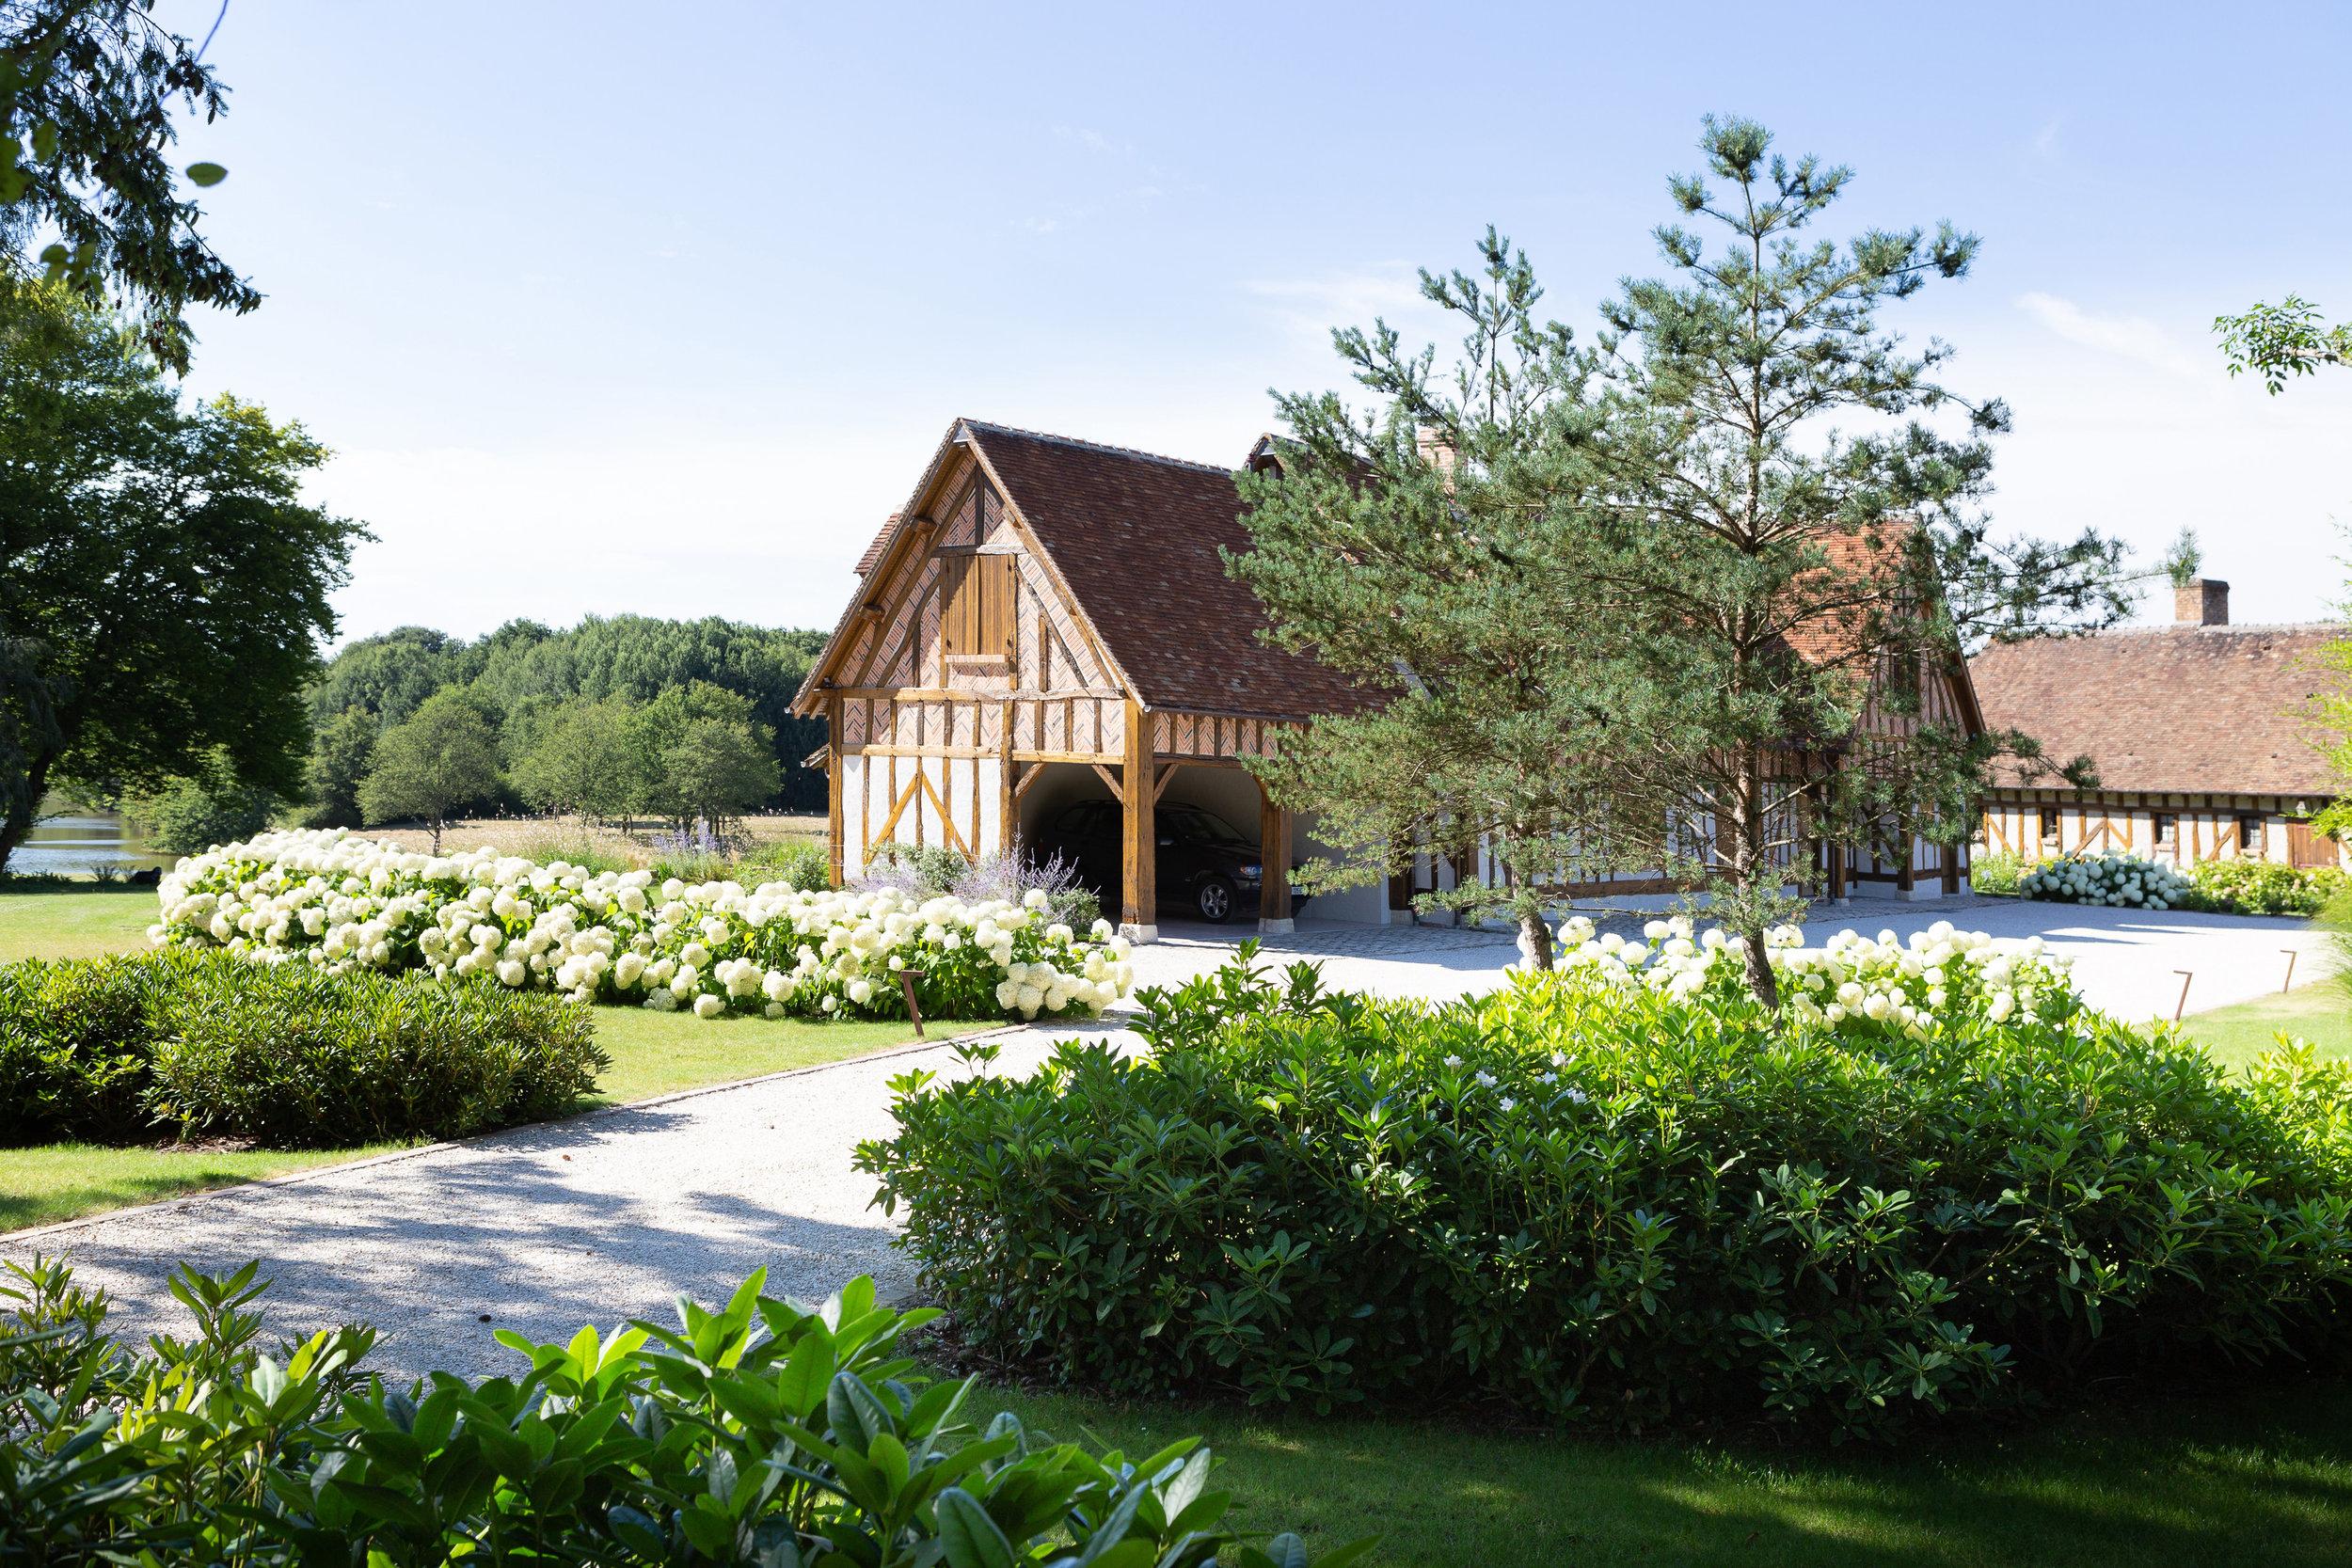 jardin_privé_vouzon_sologne_terrasses_jardins_outdoor_design_christophe_gautrand_paysagiste_10.jpg